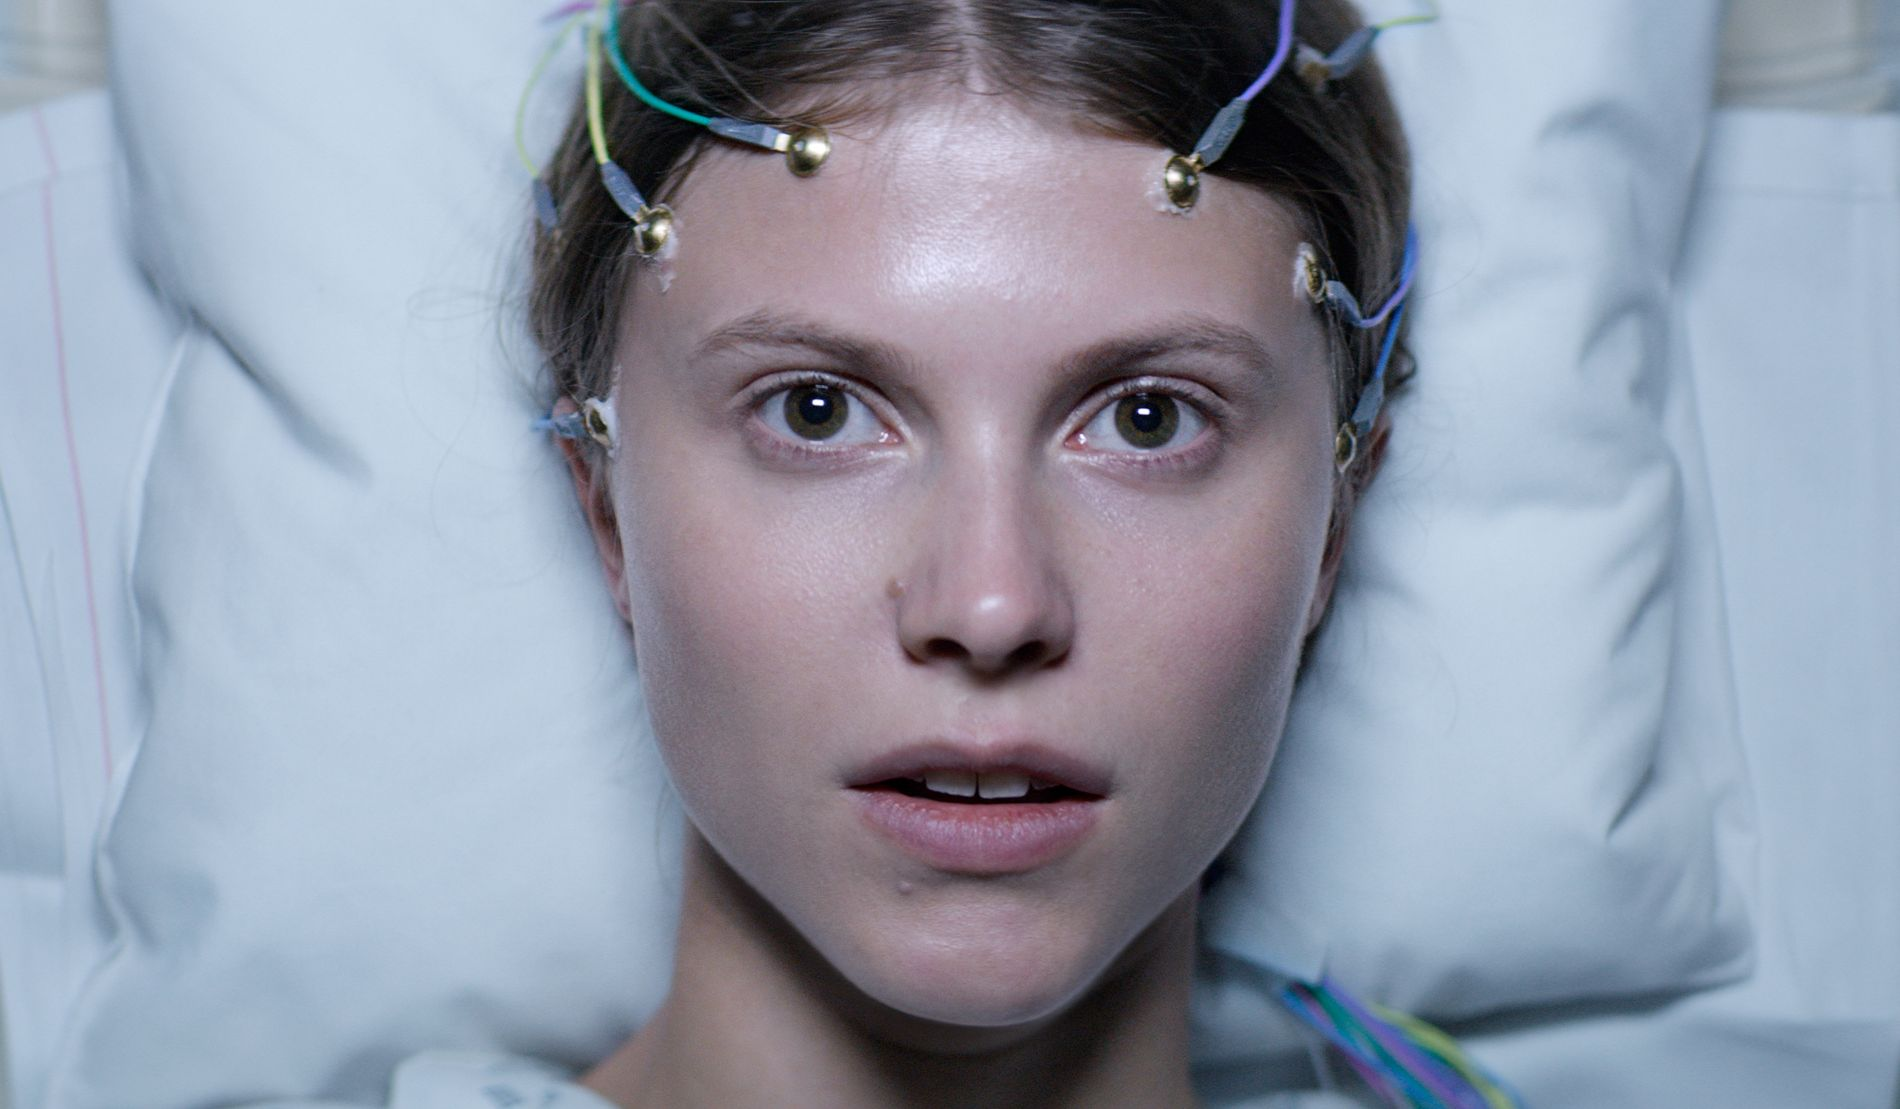 OVERNATURLIG THRILLER: Eili Harboe i tittelrollen i «Thelma». Foto: Motlys AS / SF Studios